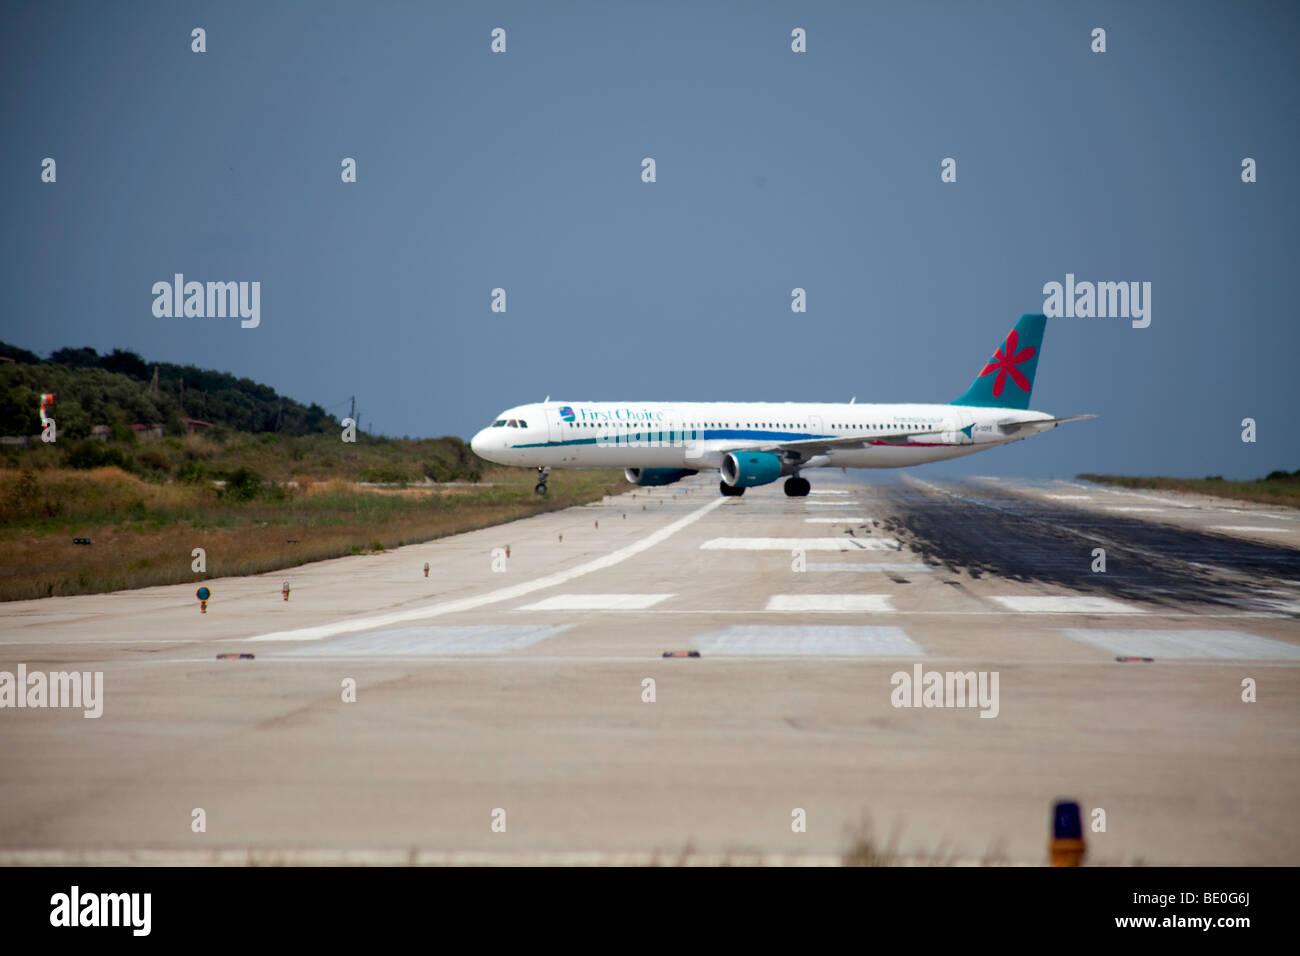 Aeroporto Skiathos : Evasione aereo nell aeroporto di skiathos grecia foto